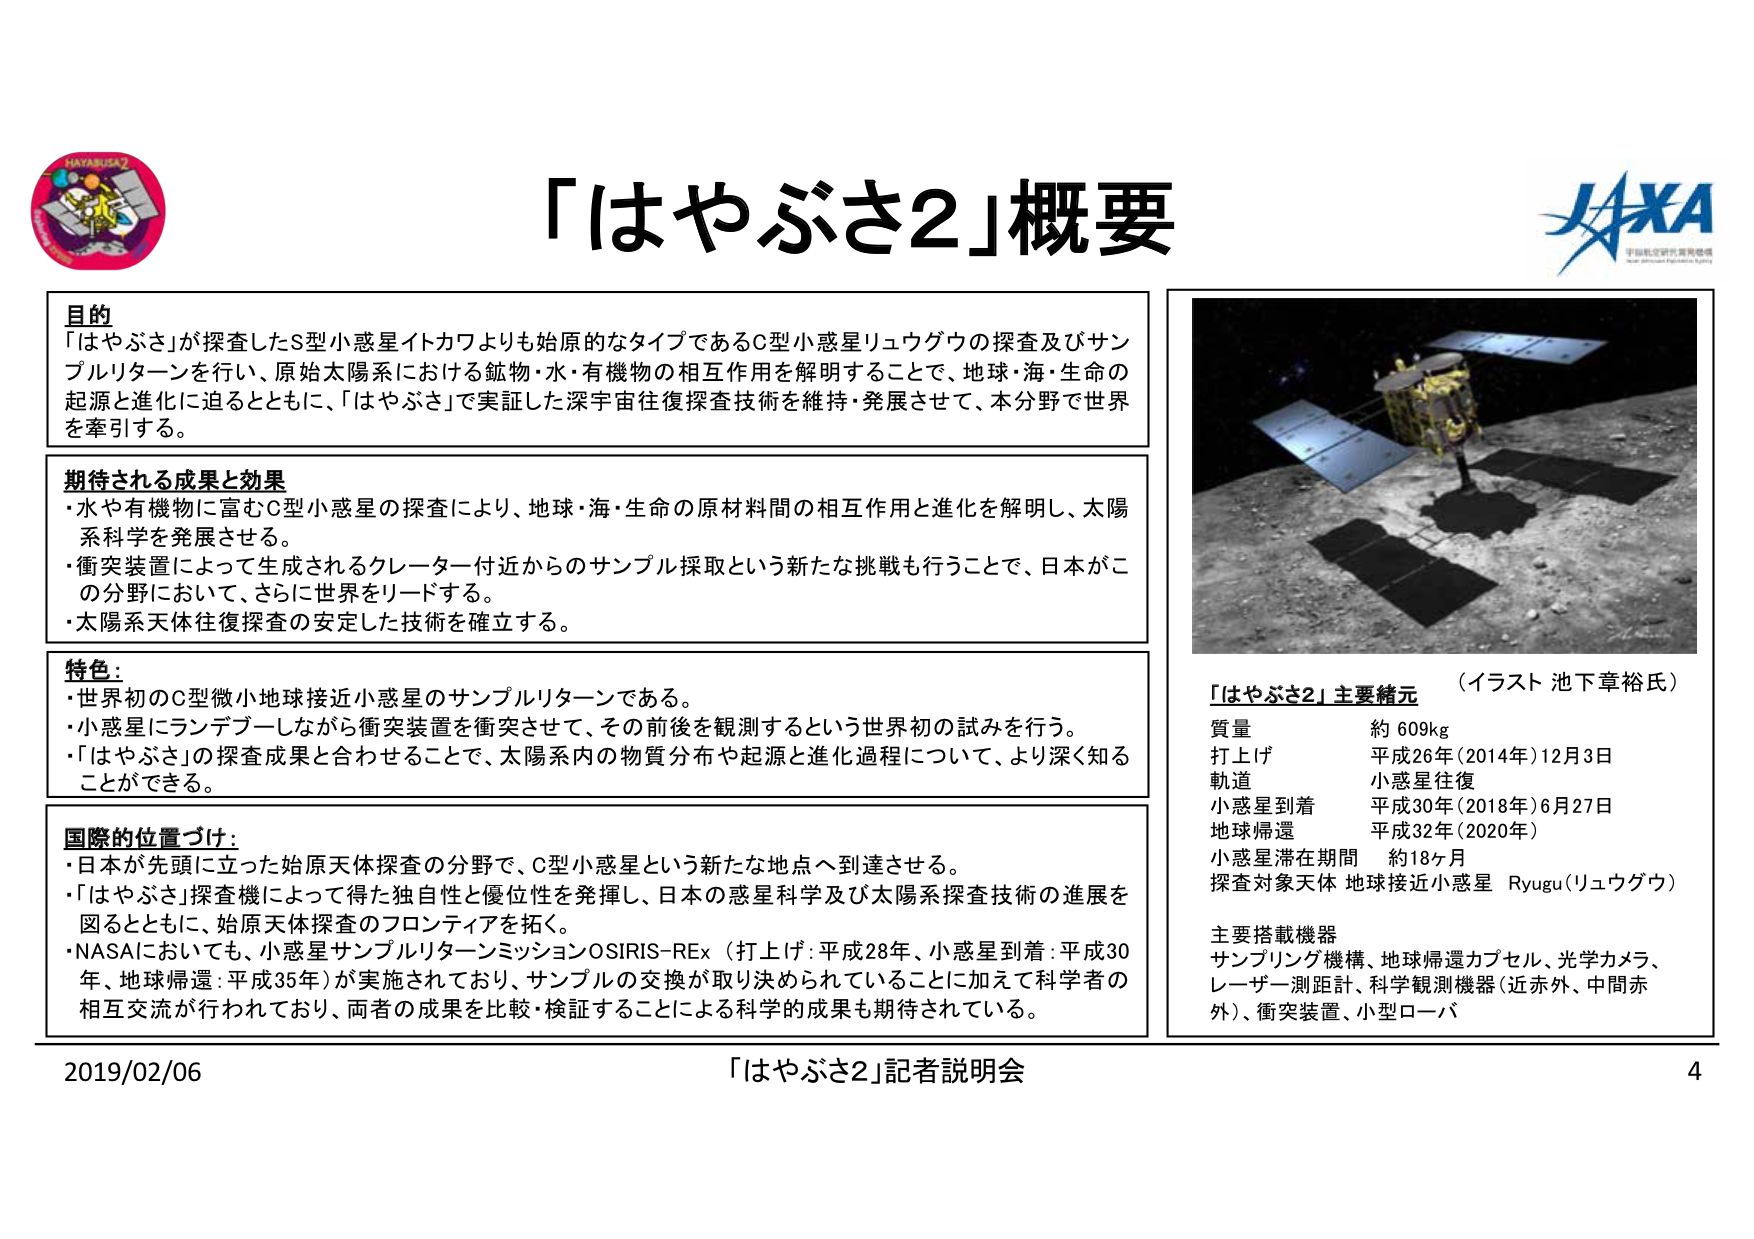 f:id:Imamura:20190204175458p:plain